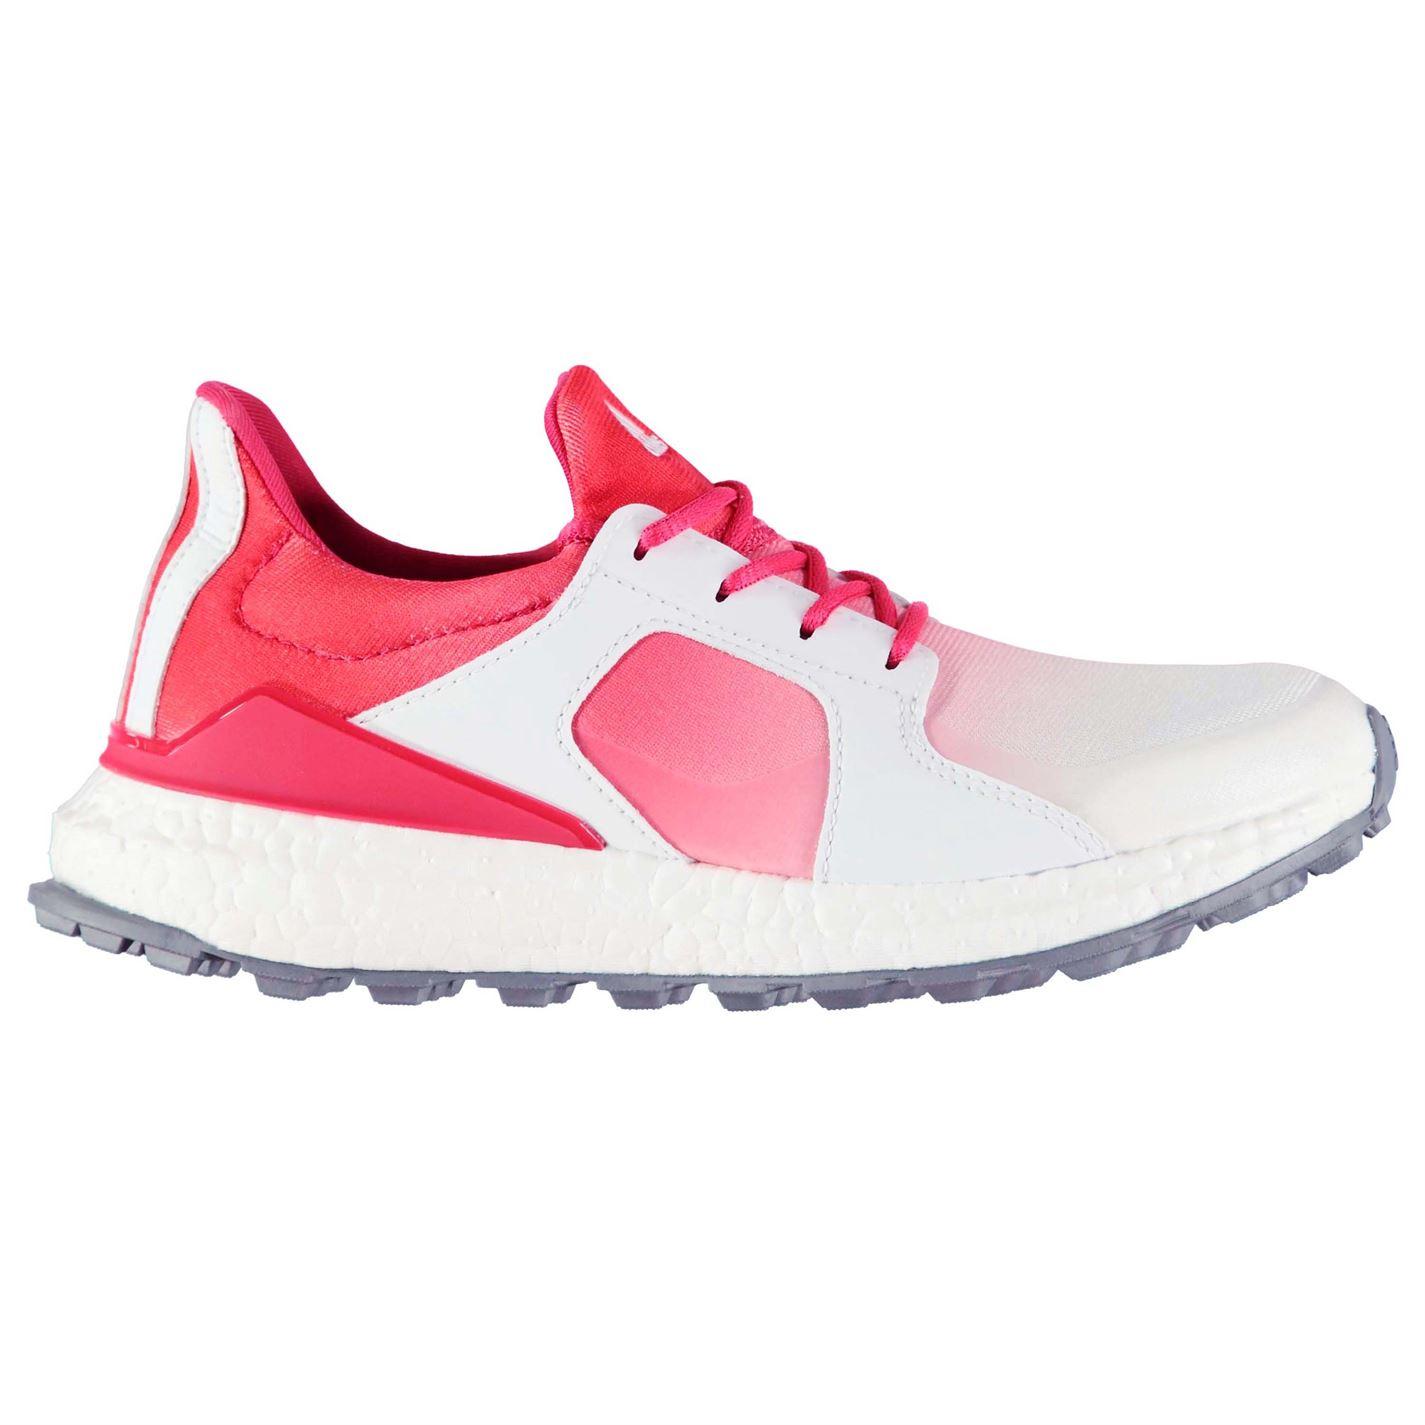 Adidas Crossknit Boost Golf Shoes Ladies